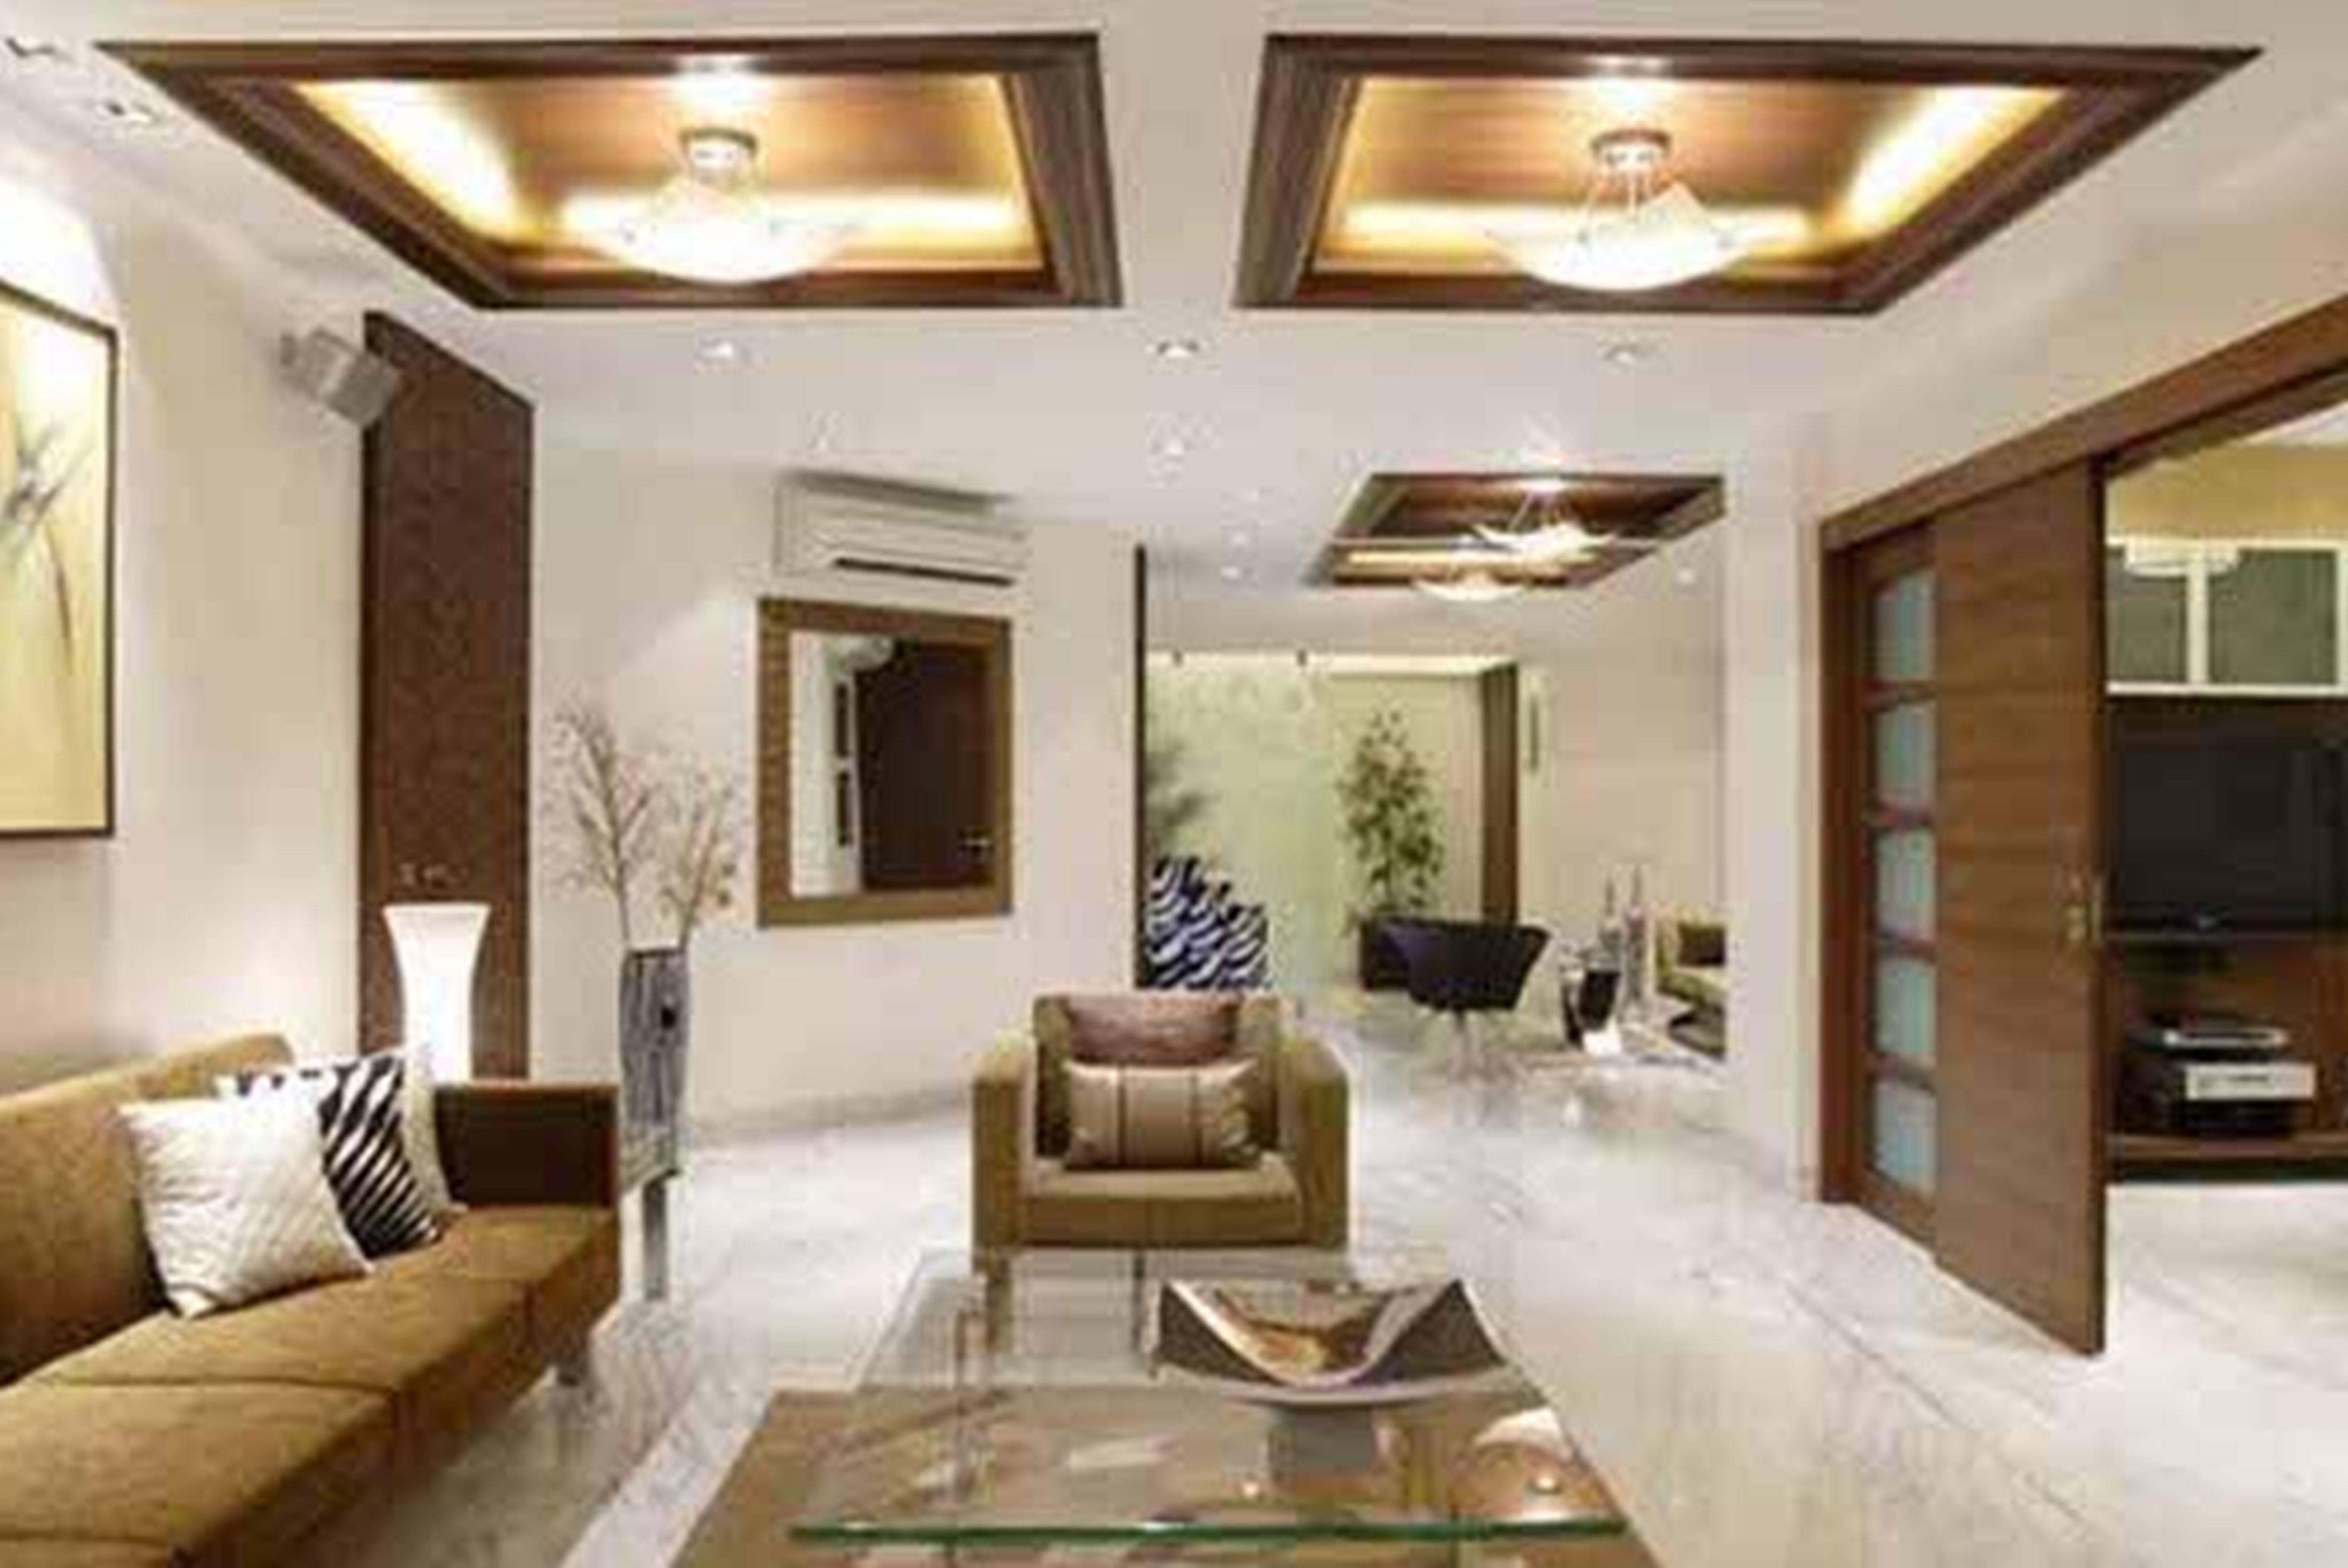 interior design ideas pakistan Indian living rooms